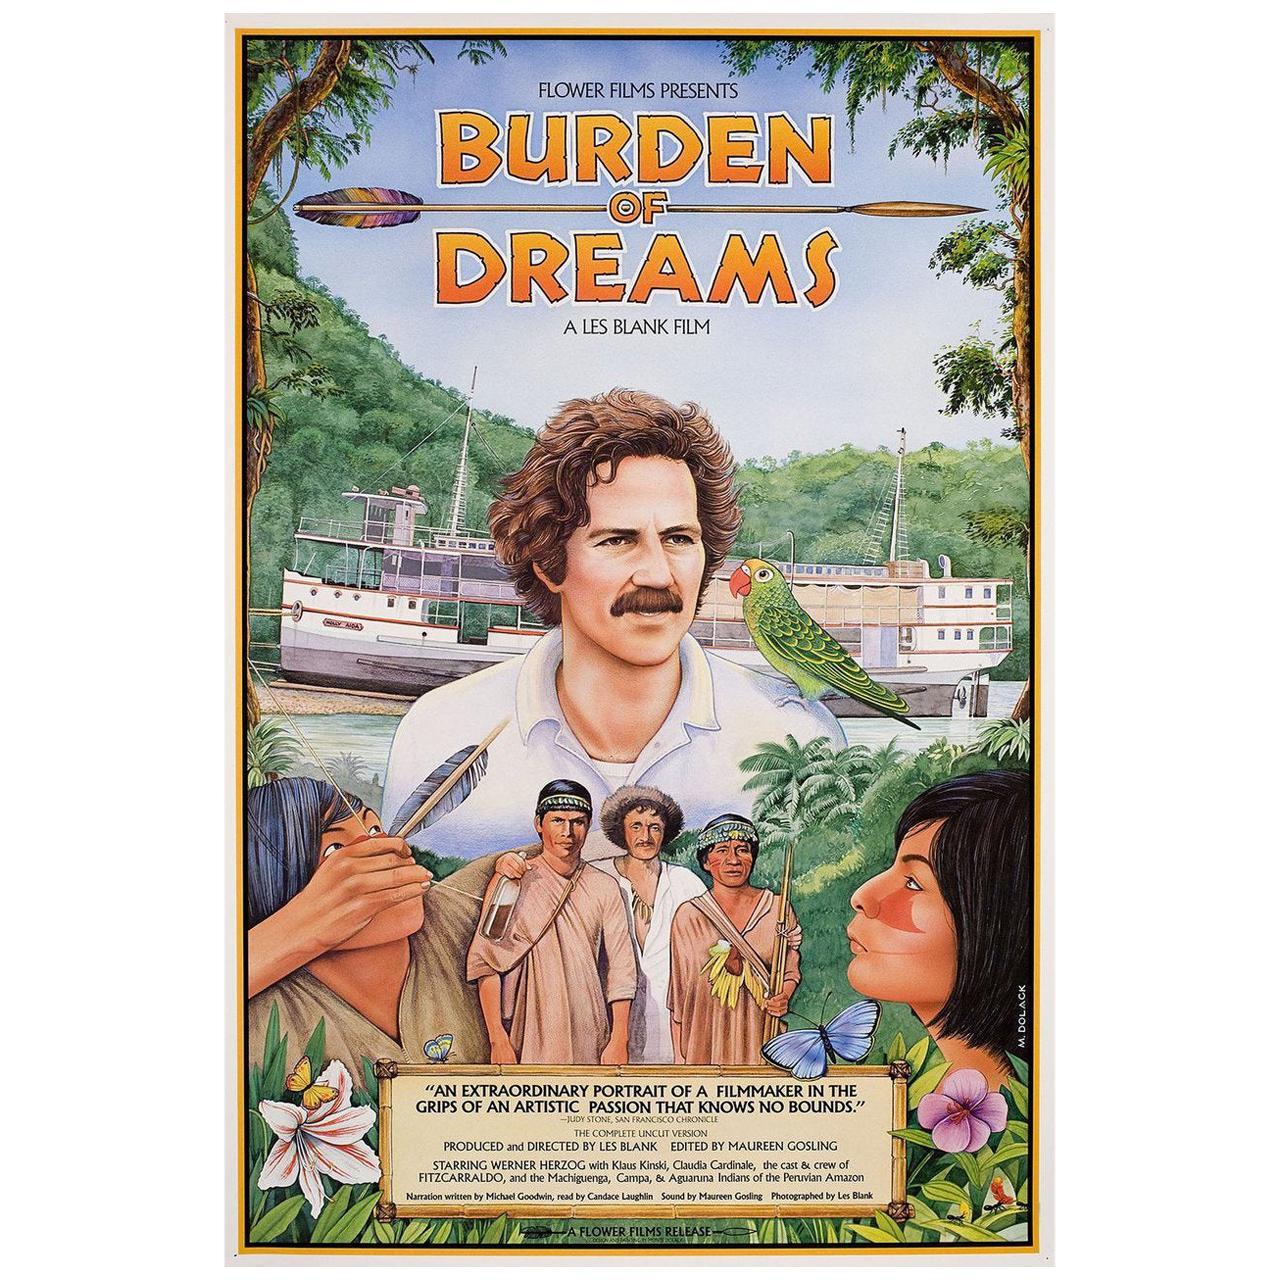 'Burden of Dreams' 1982 U.S. Film Poster